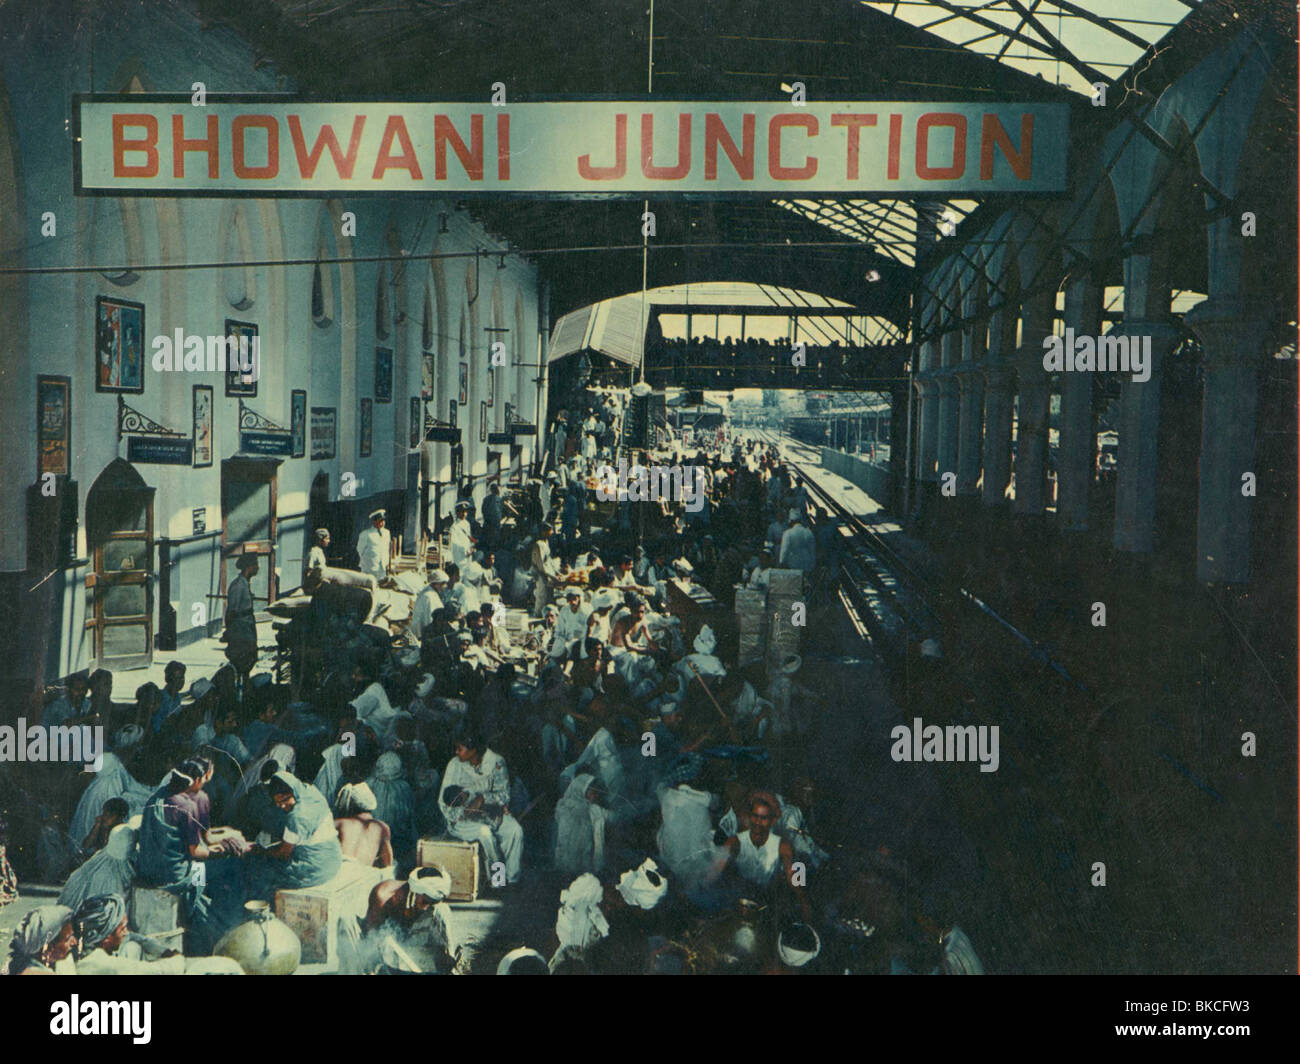 BHOWANI JUNCTION -1956 - Stock Image